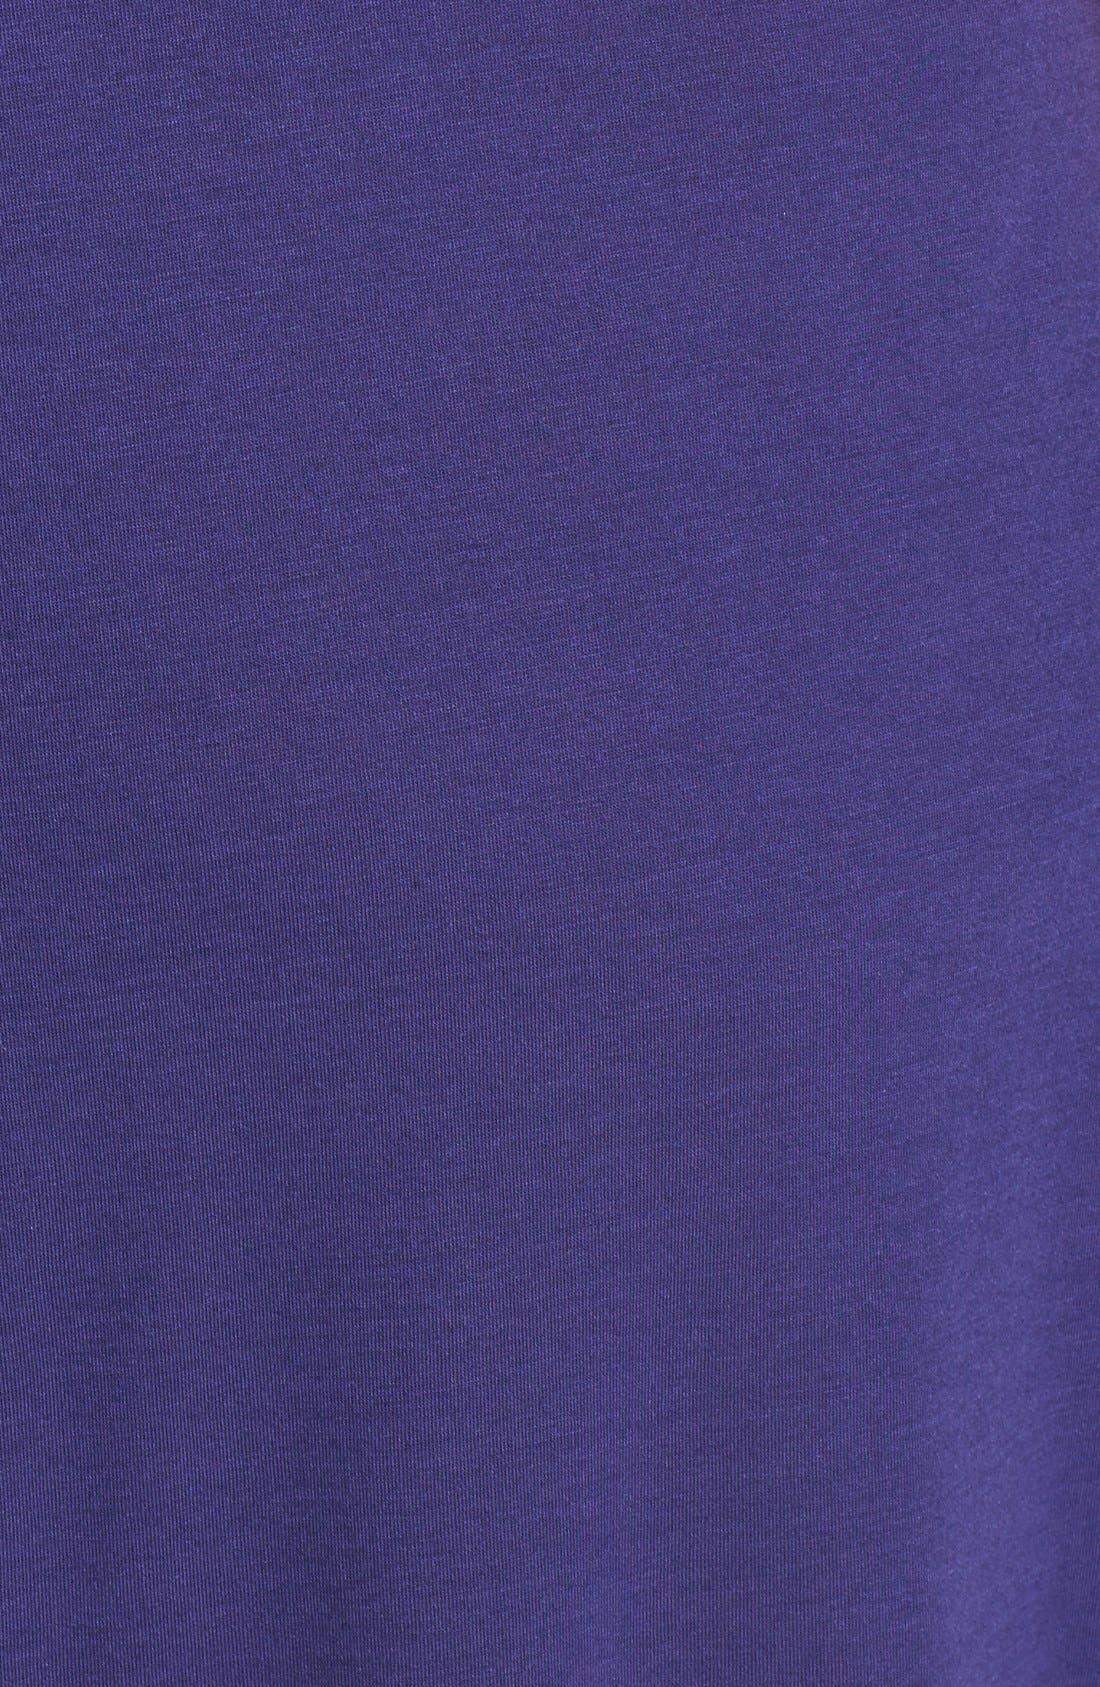 'Shangri La' Nightgown,                             Alternate thumbnail 3, color,                             Twilight Blue